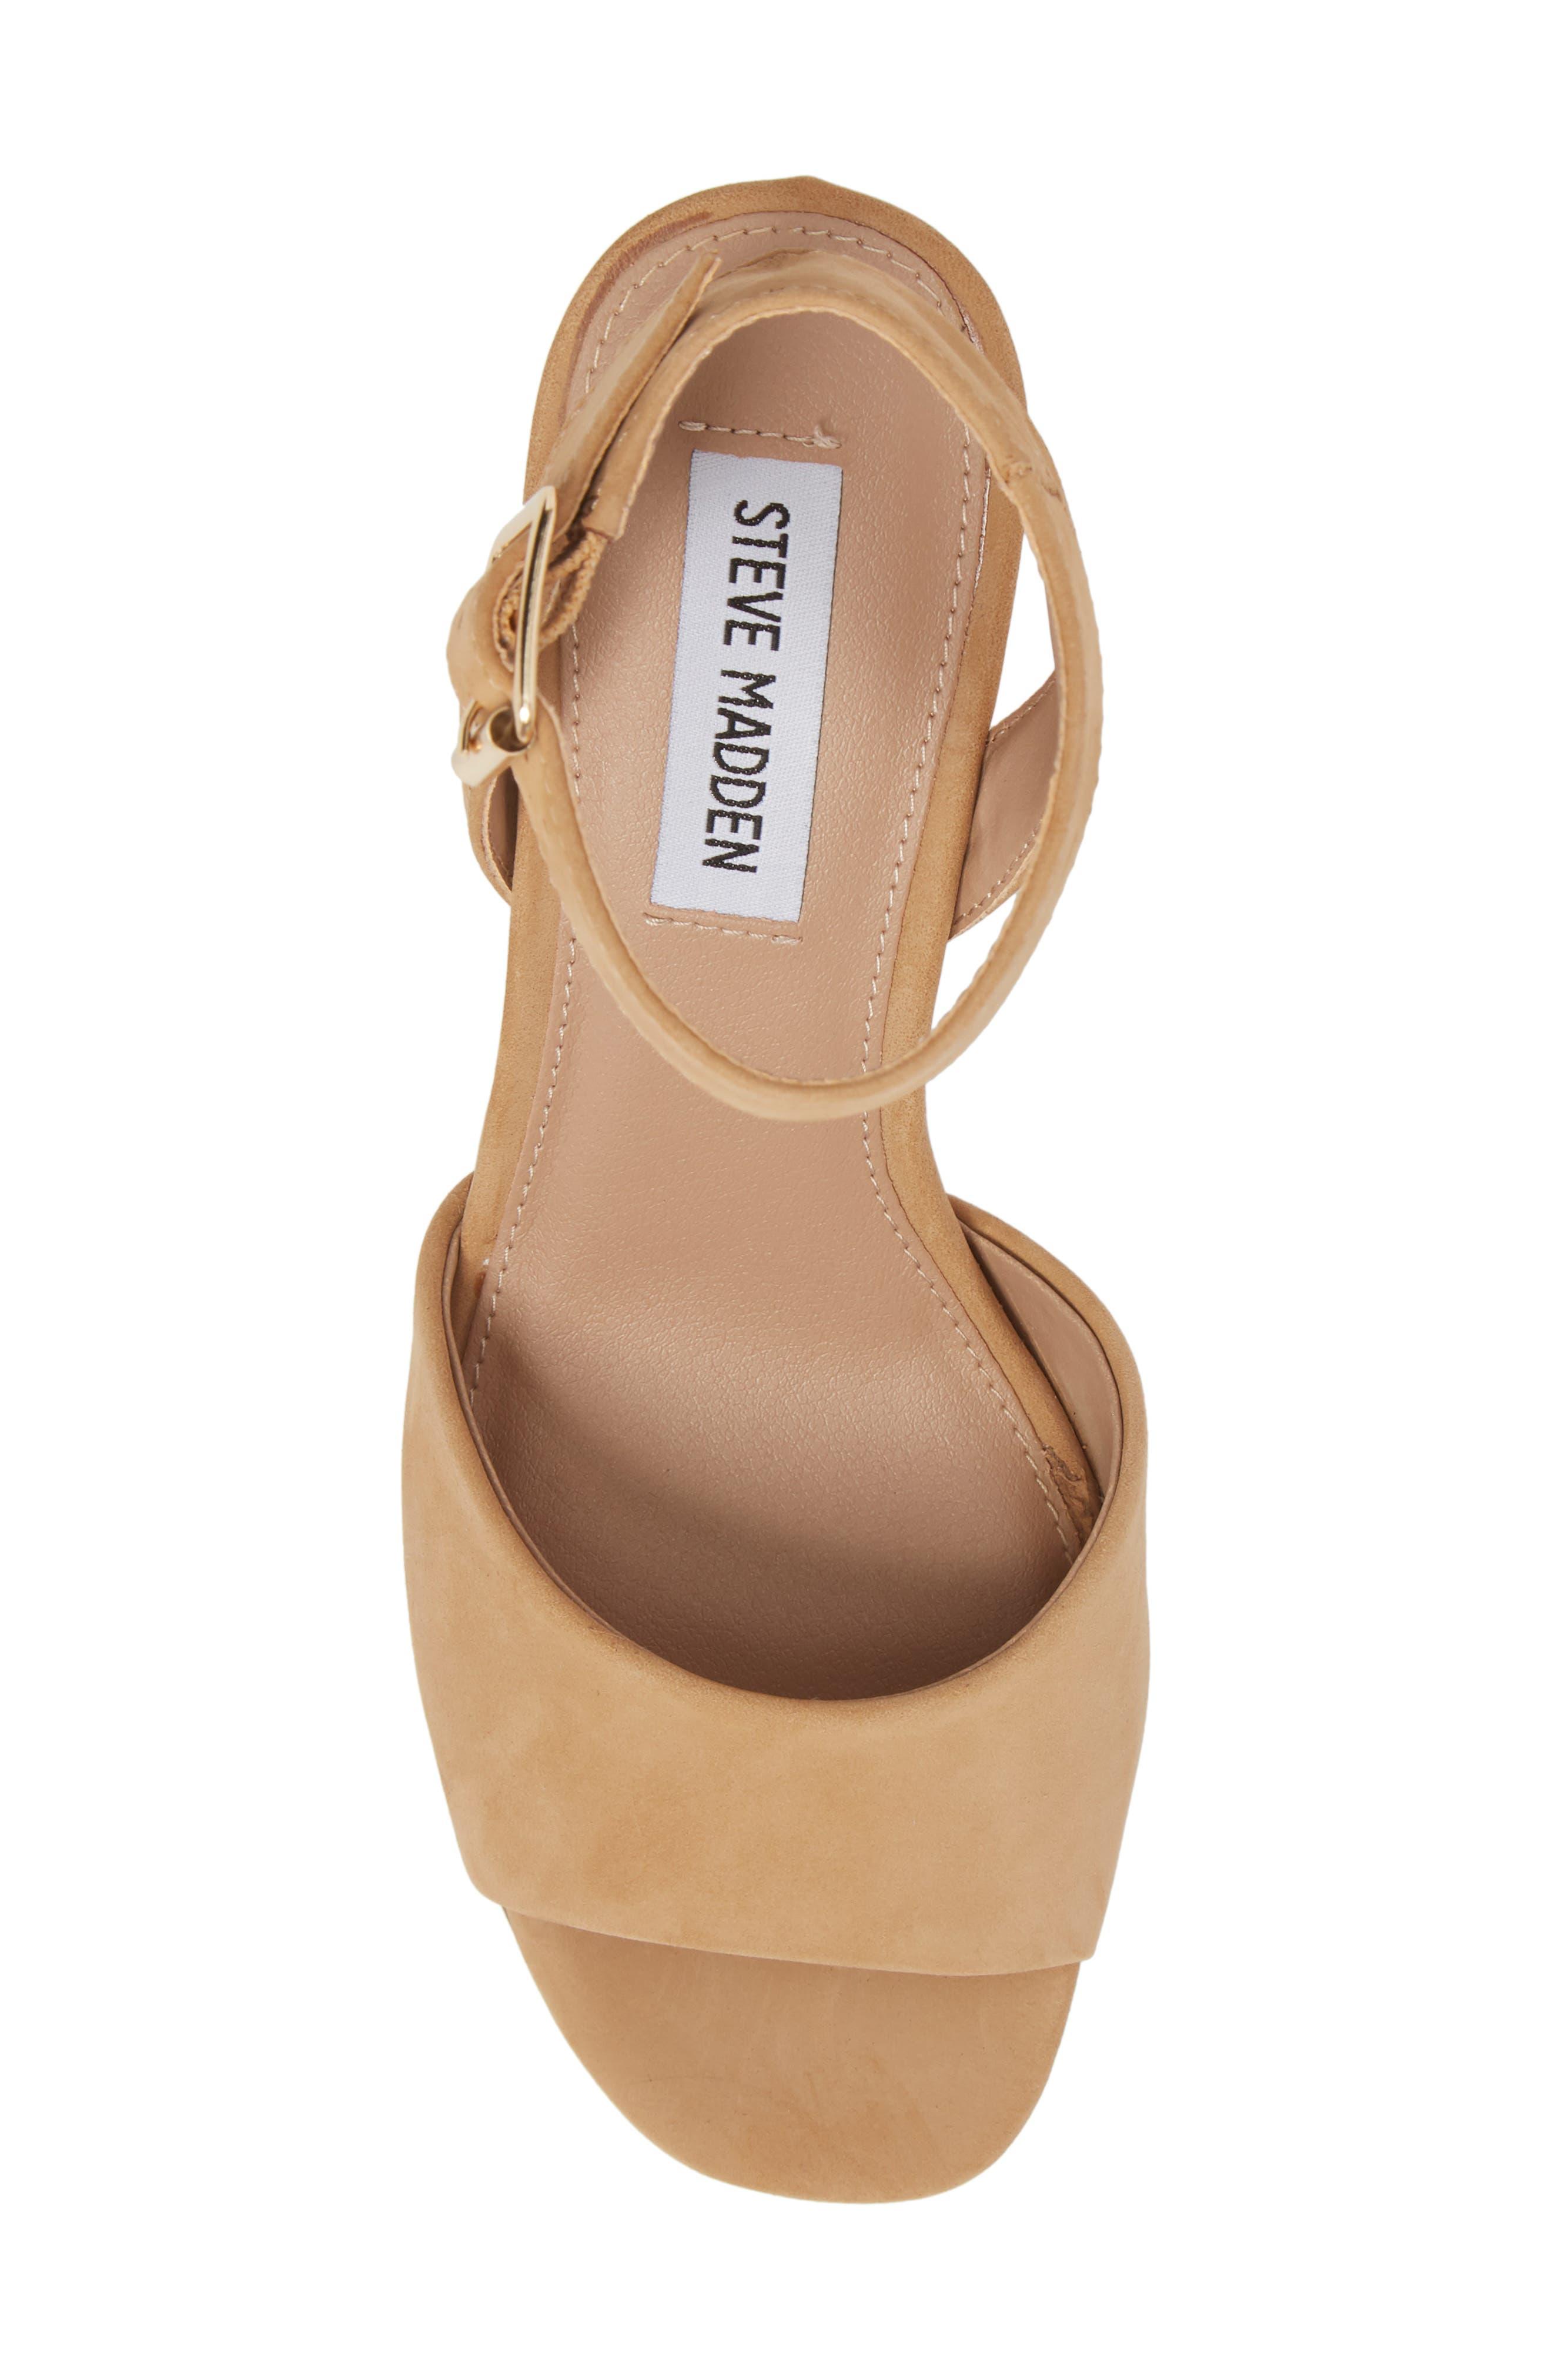 Devlin Block Heel Sandal,                             Alternate thumbnail 5, color,                             200